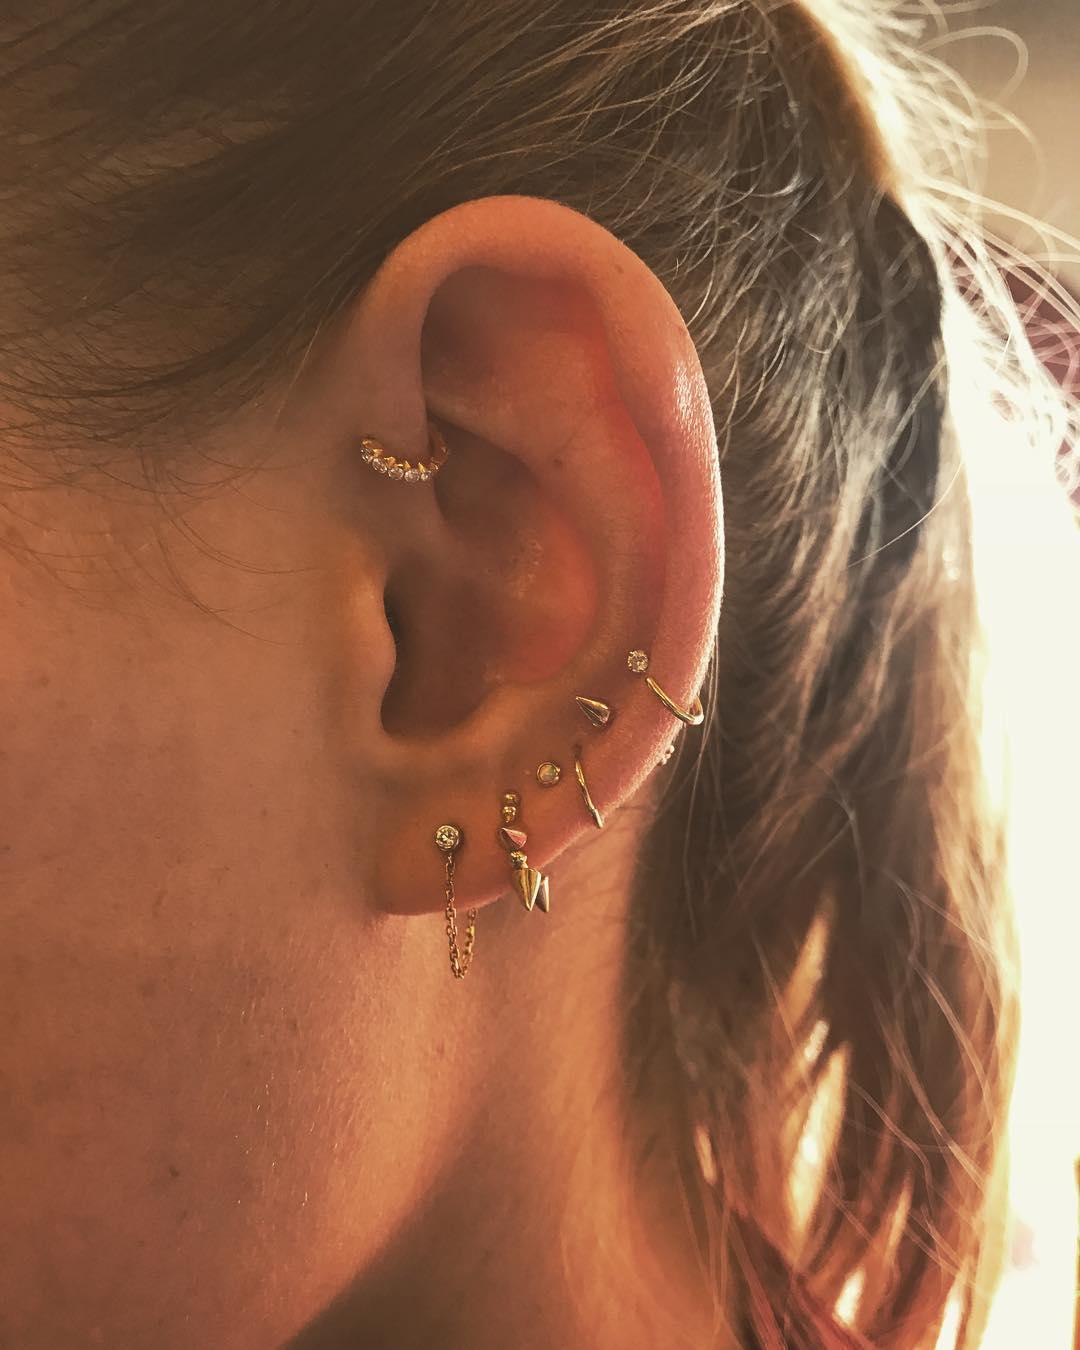 Piercings na orelha combinando